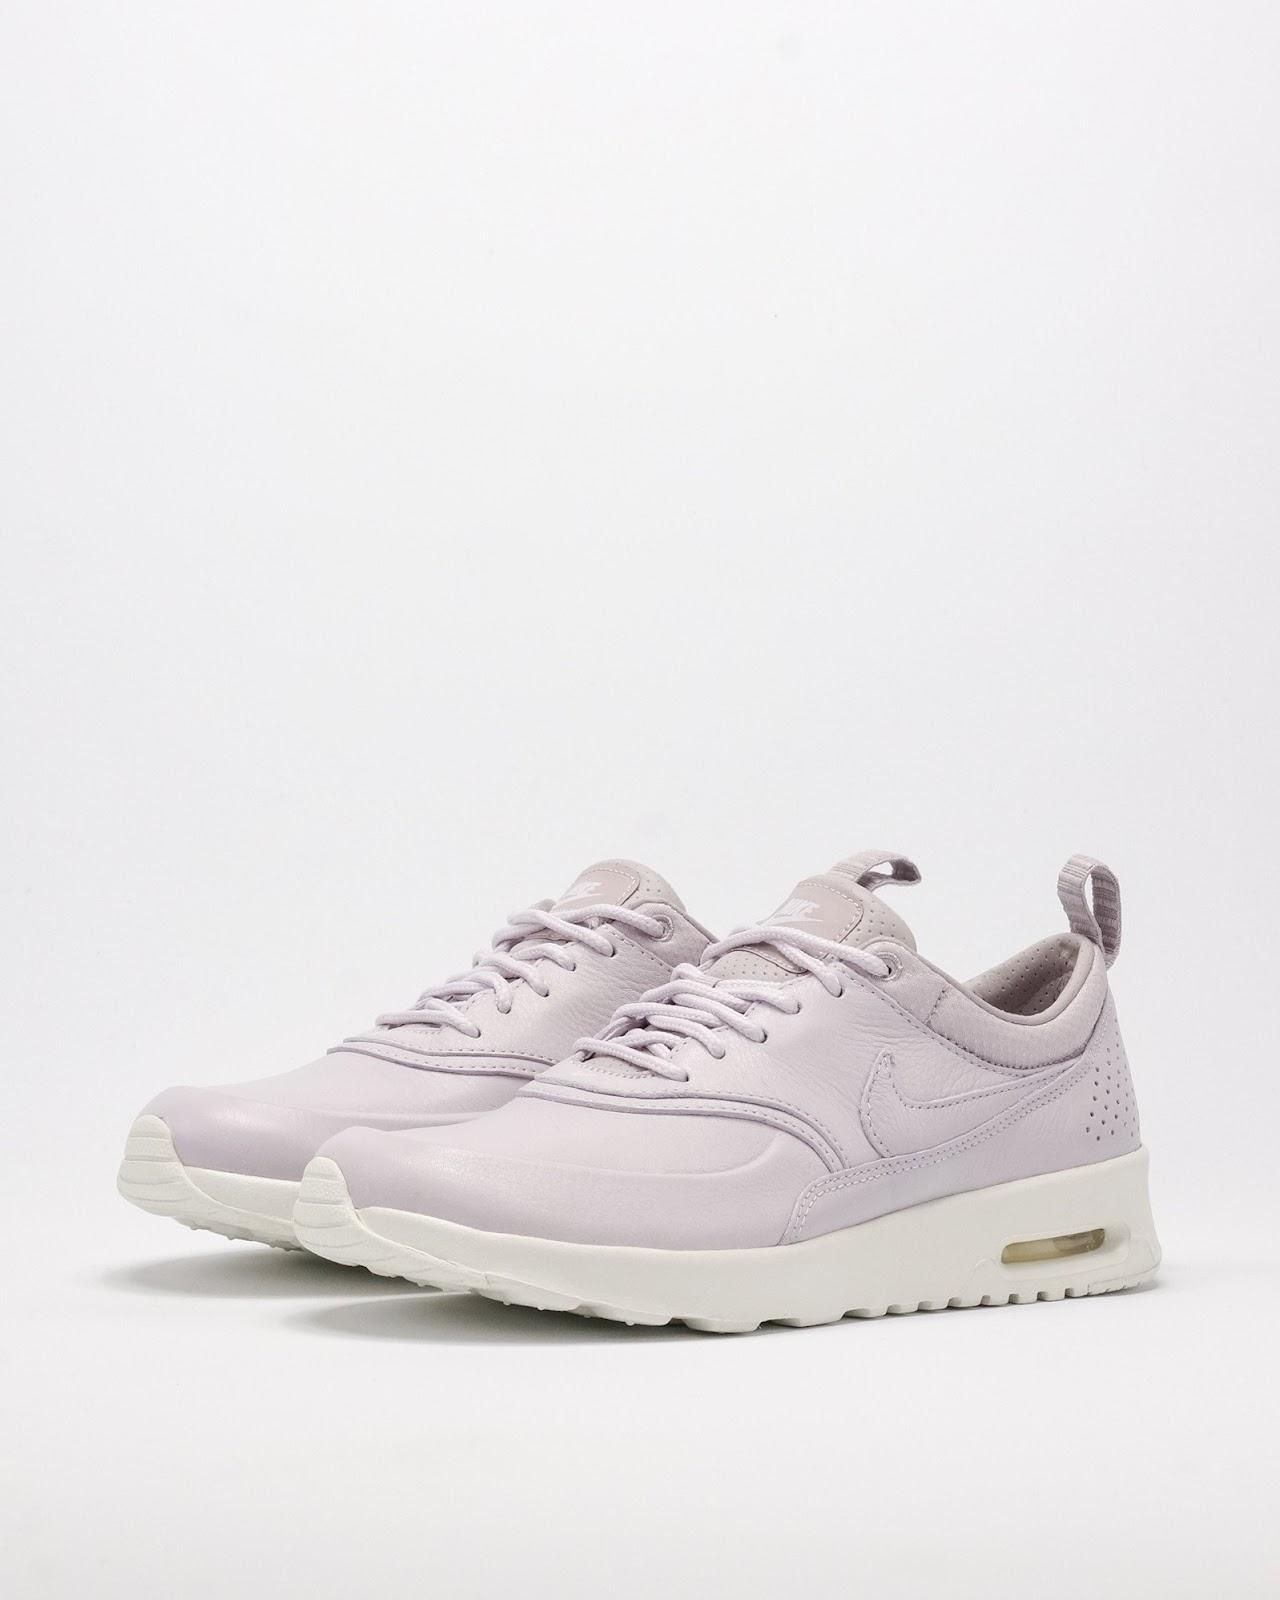 nike-lab-air-max-thea-sneaker-839611-500-venice-violet-ash-05.jpg